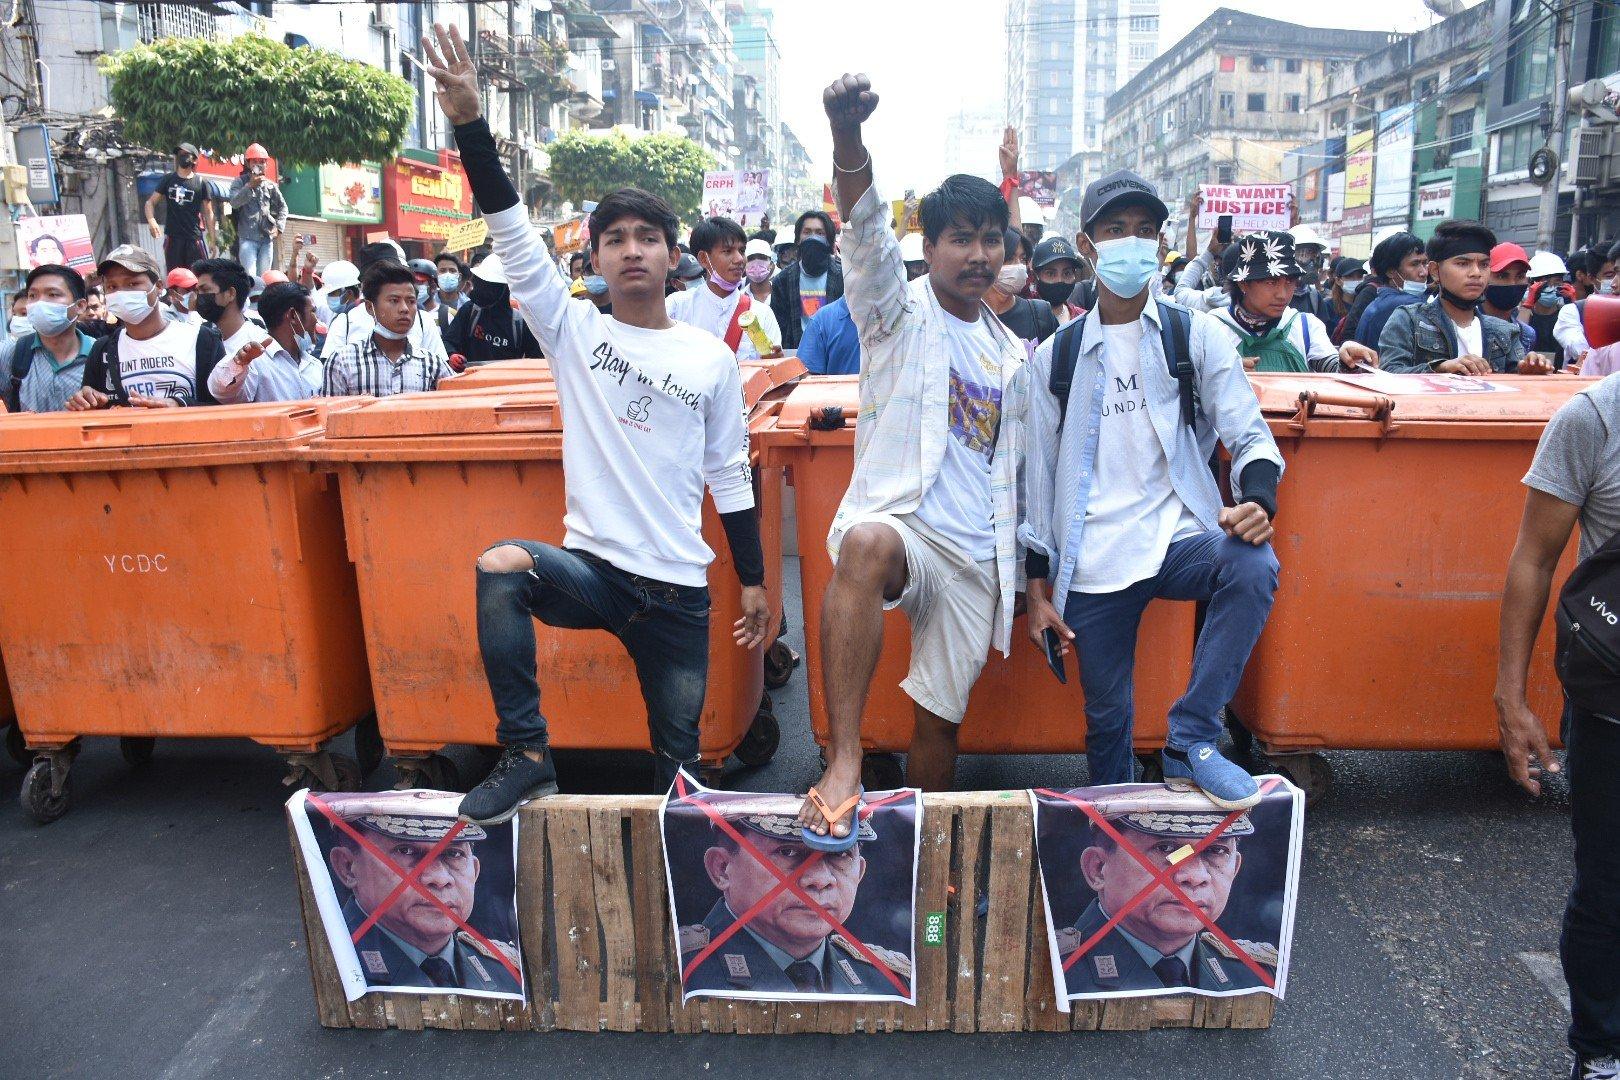 Myanmar, polizia spara e uccide manifestanti durante proteste